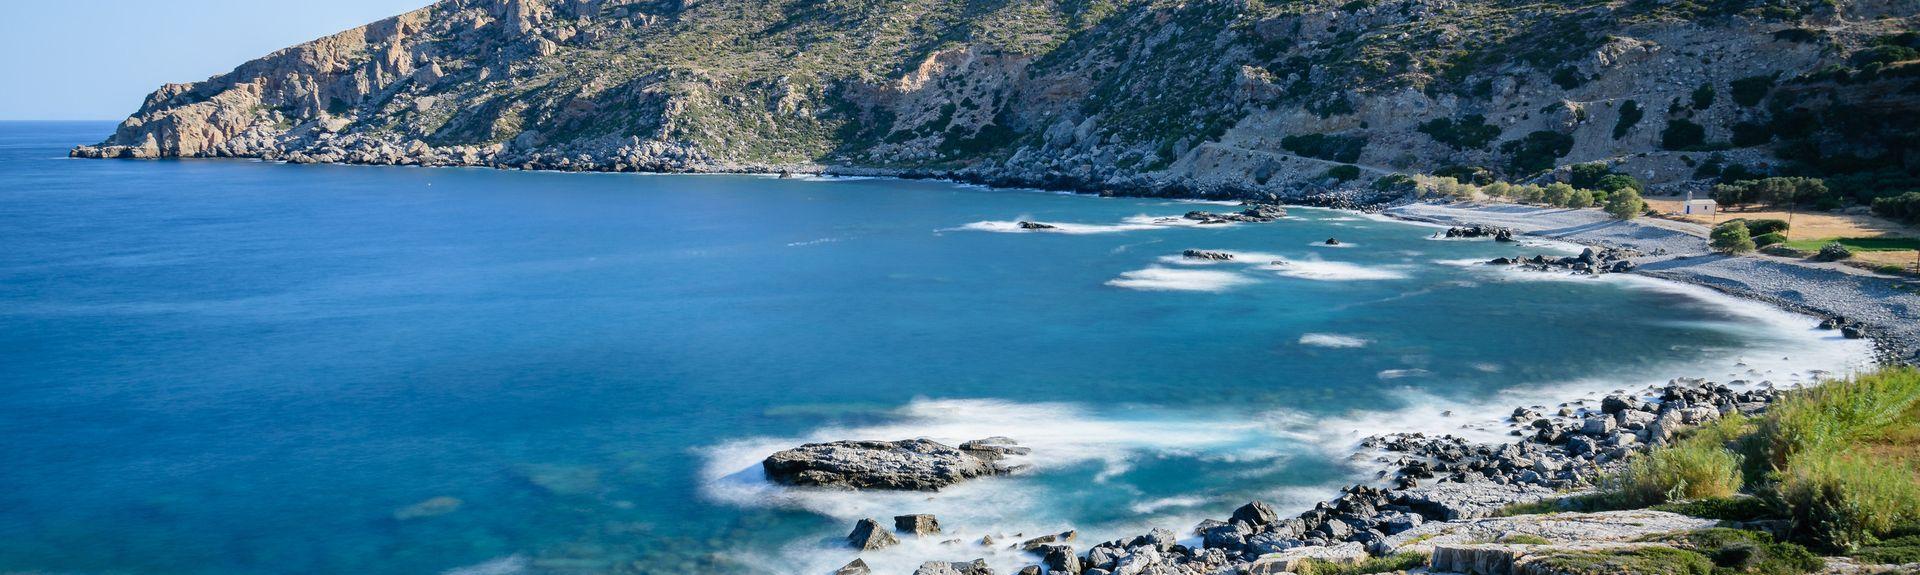 Amigdalokefali, Kissamos, Kreta, Griechenland